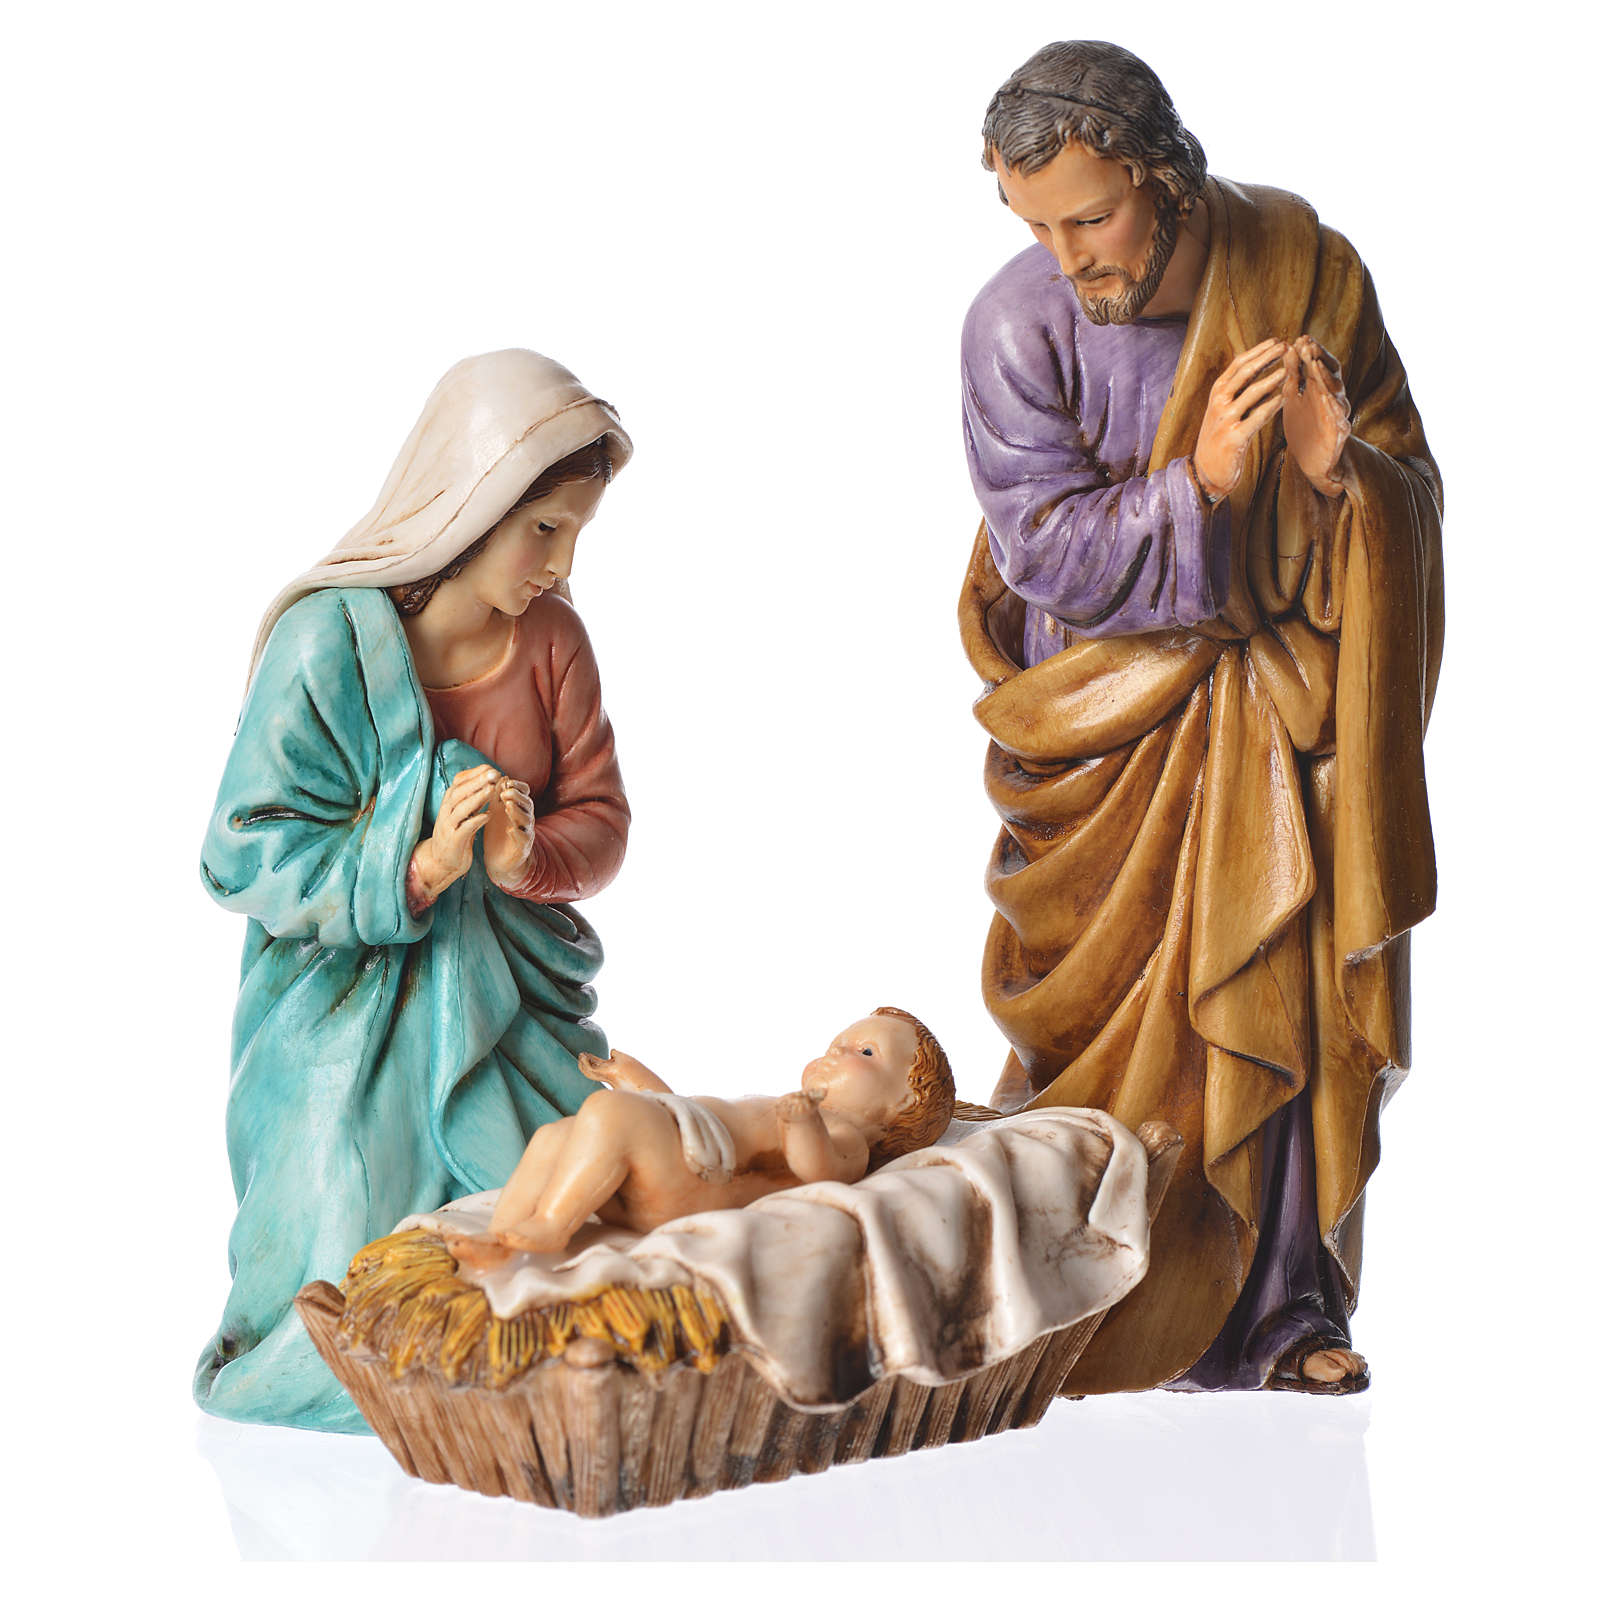 Natividad 13 cm belén Moranduzzo 3 figuras 4